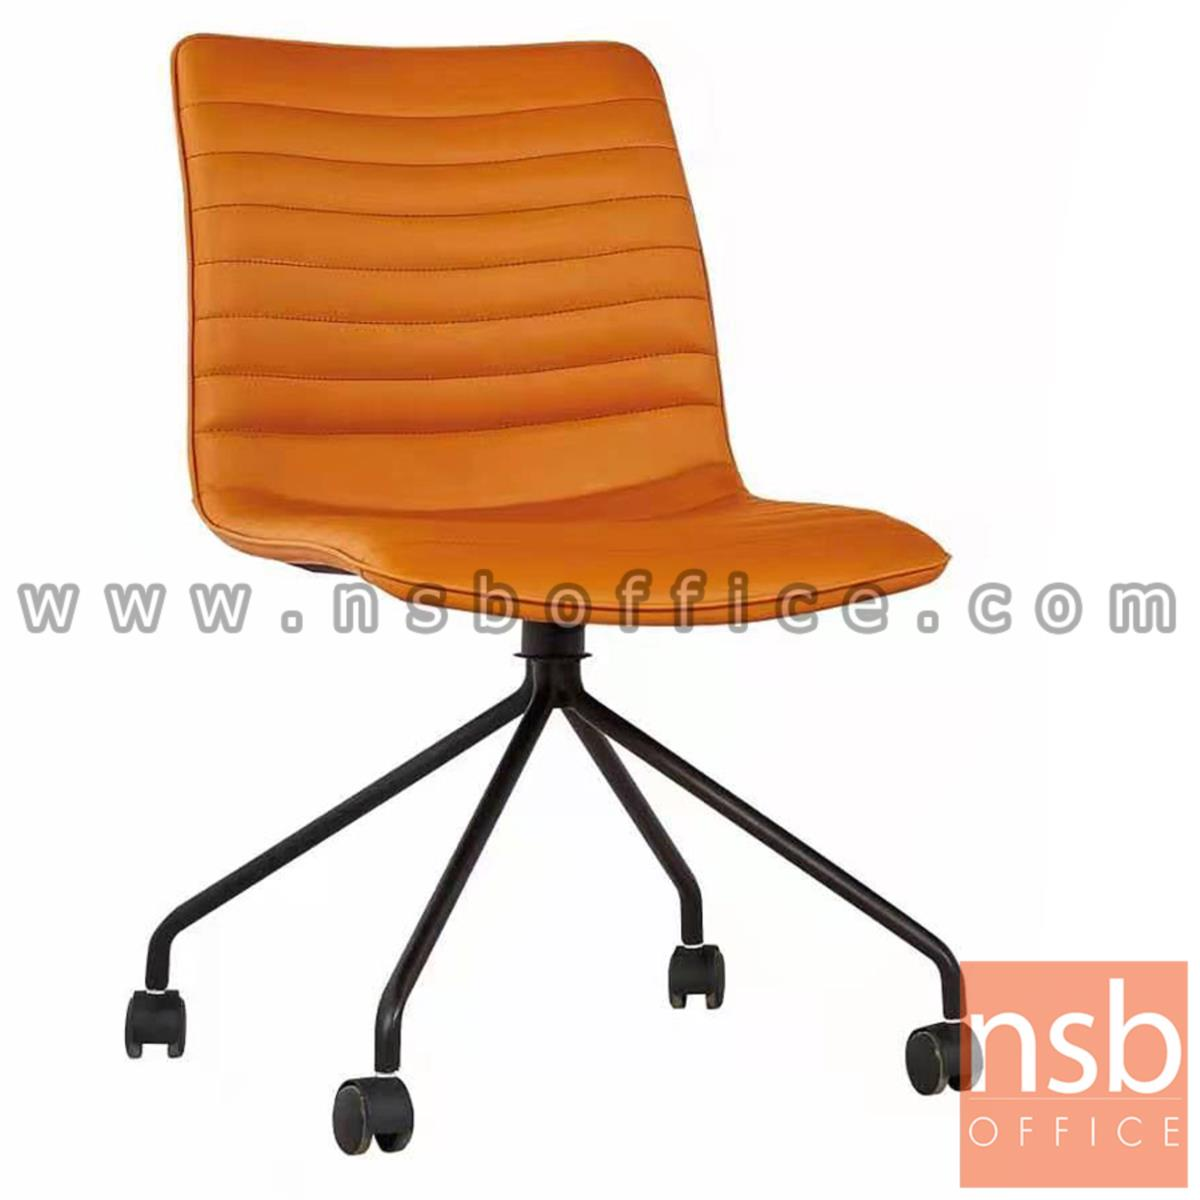 B33A010:เก้าอี้สำนักงาน รุ่น Greyhound (เกรย์ฮาวด์)  ล้อเลื่อน